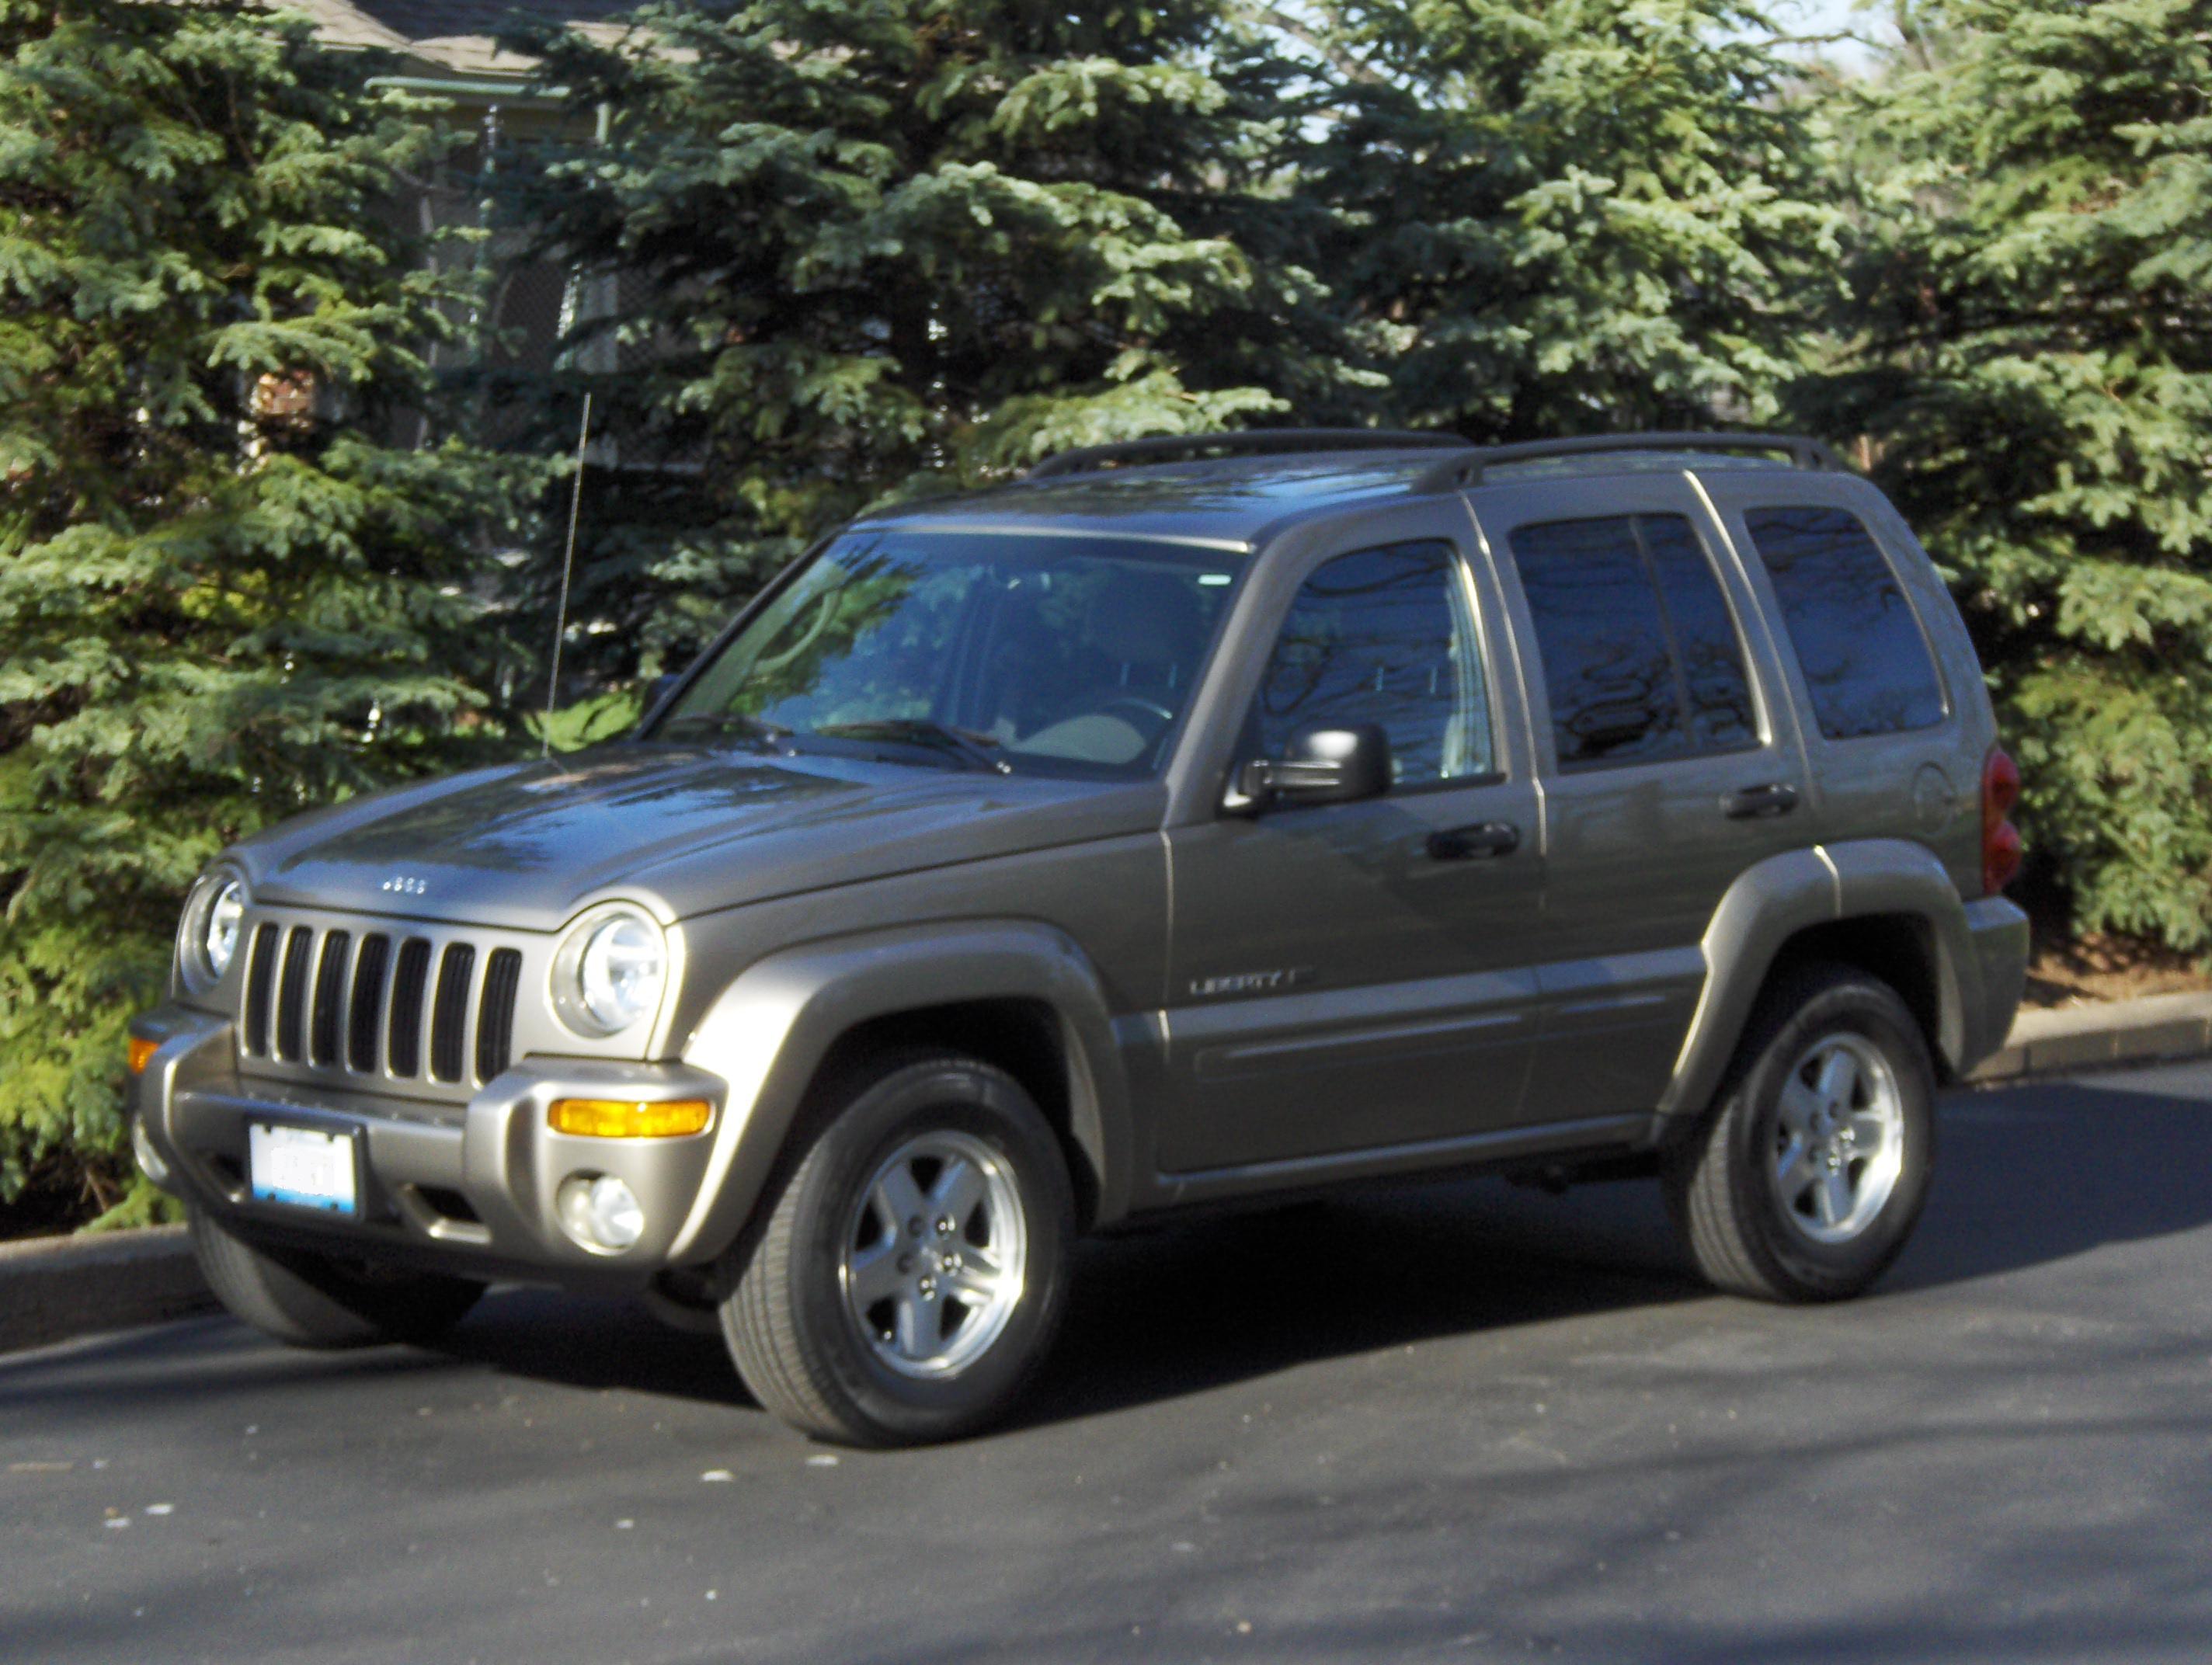 2003 jeep liberty partsopen. Black Bedroom Furniture Sets. Home Design Ideas